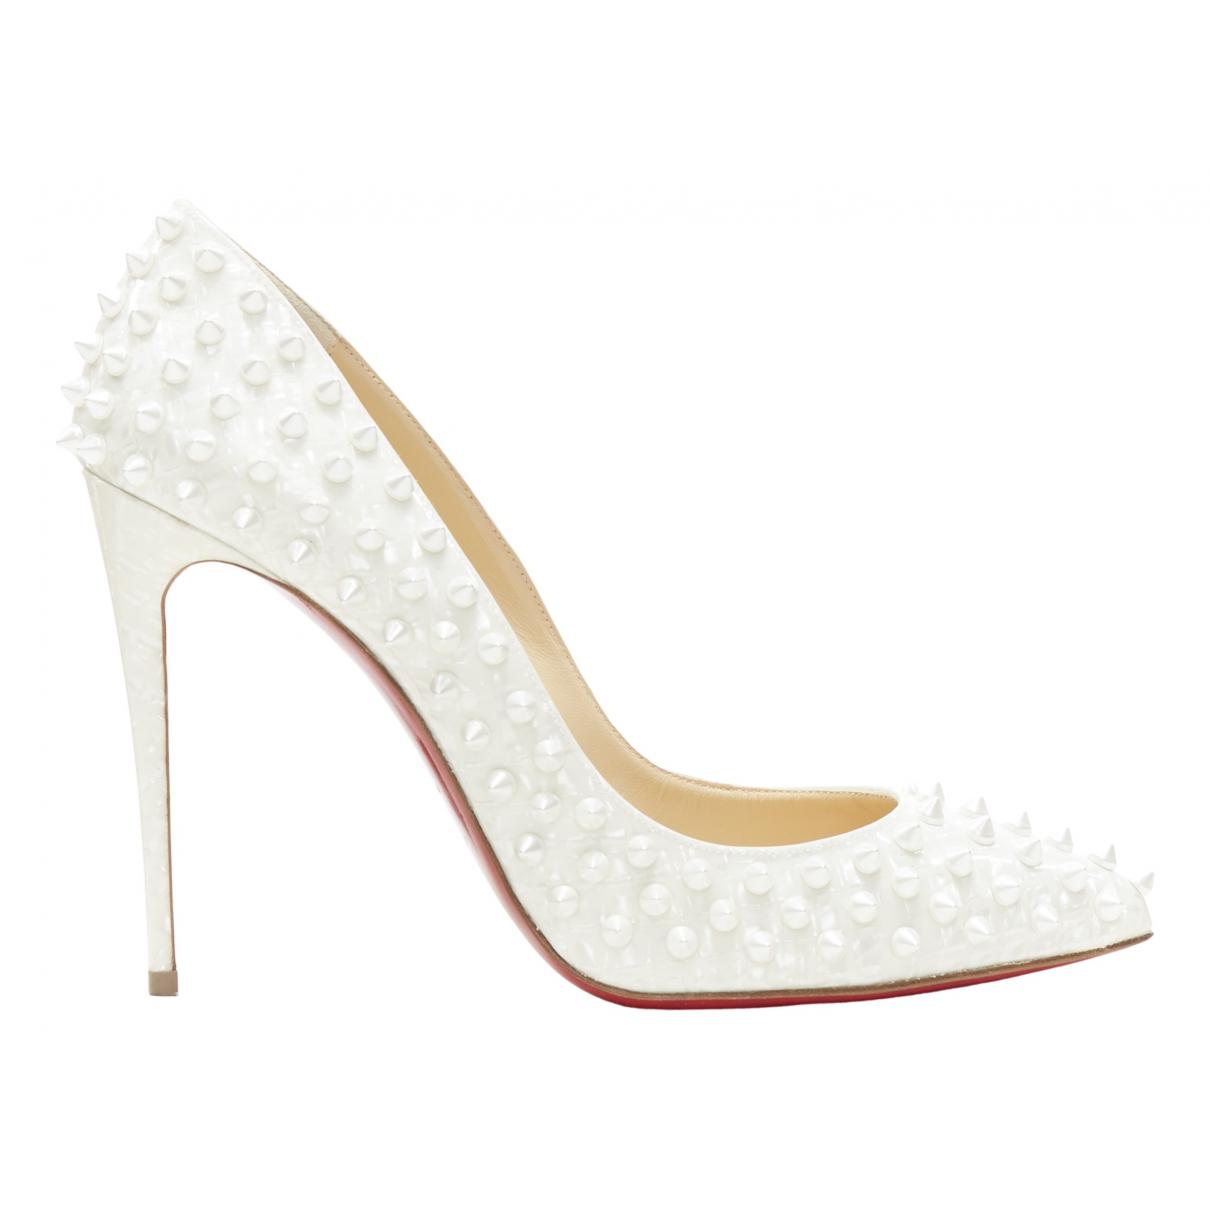 Christian Louboutin \N White Patent leather Heels for Women 39.5 EU